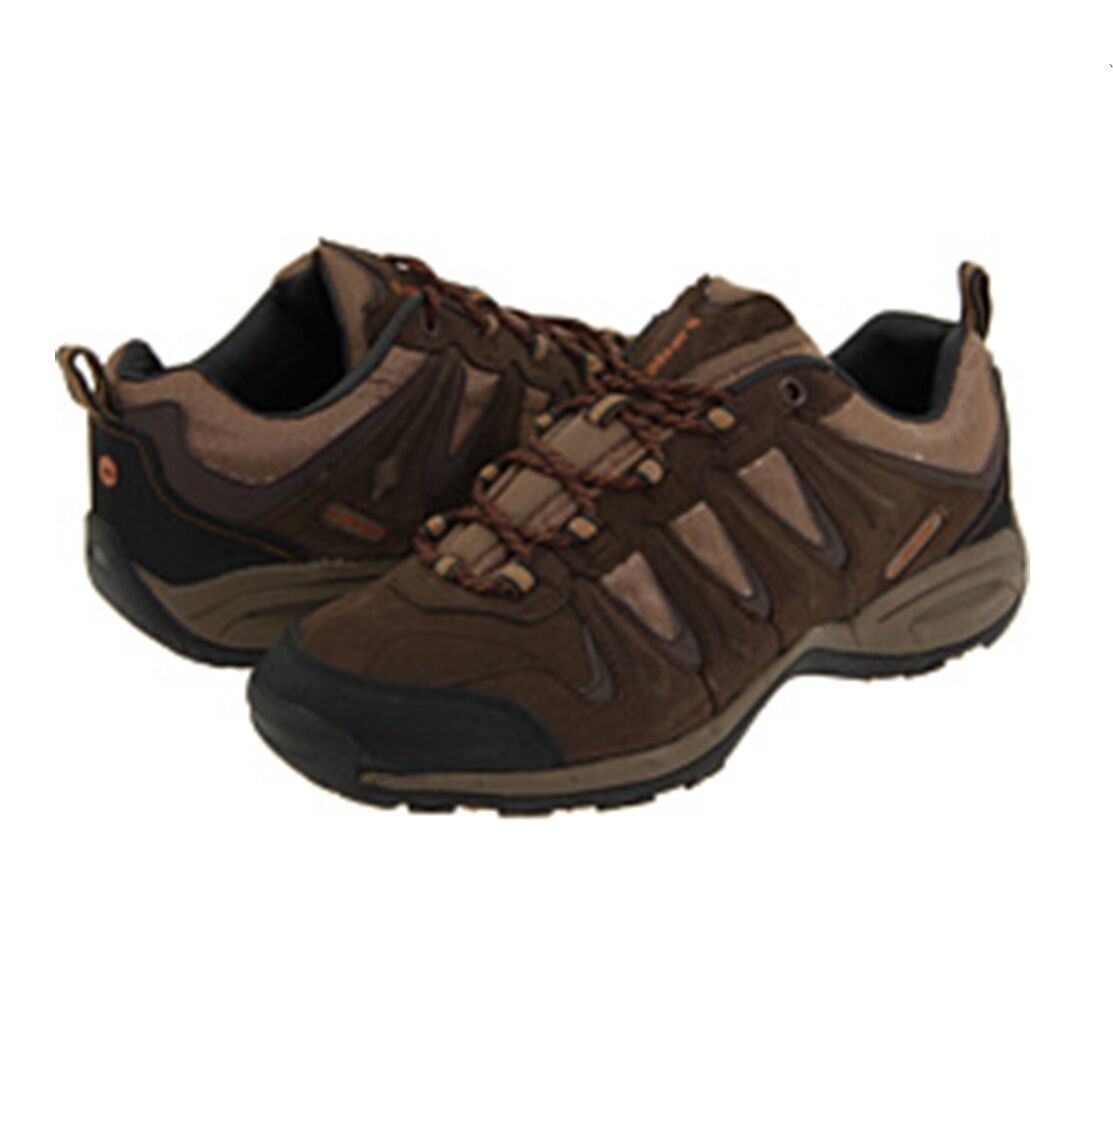 NEW Uomo Hi-Tec Trail Dust Nubuck leather Shoes Dark Chocolate 9